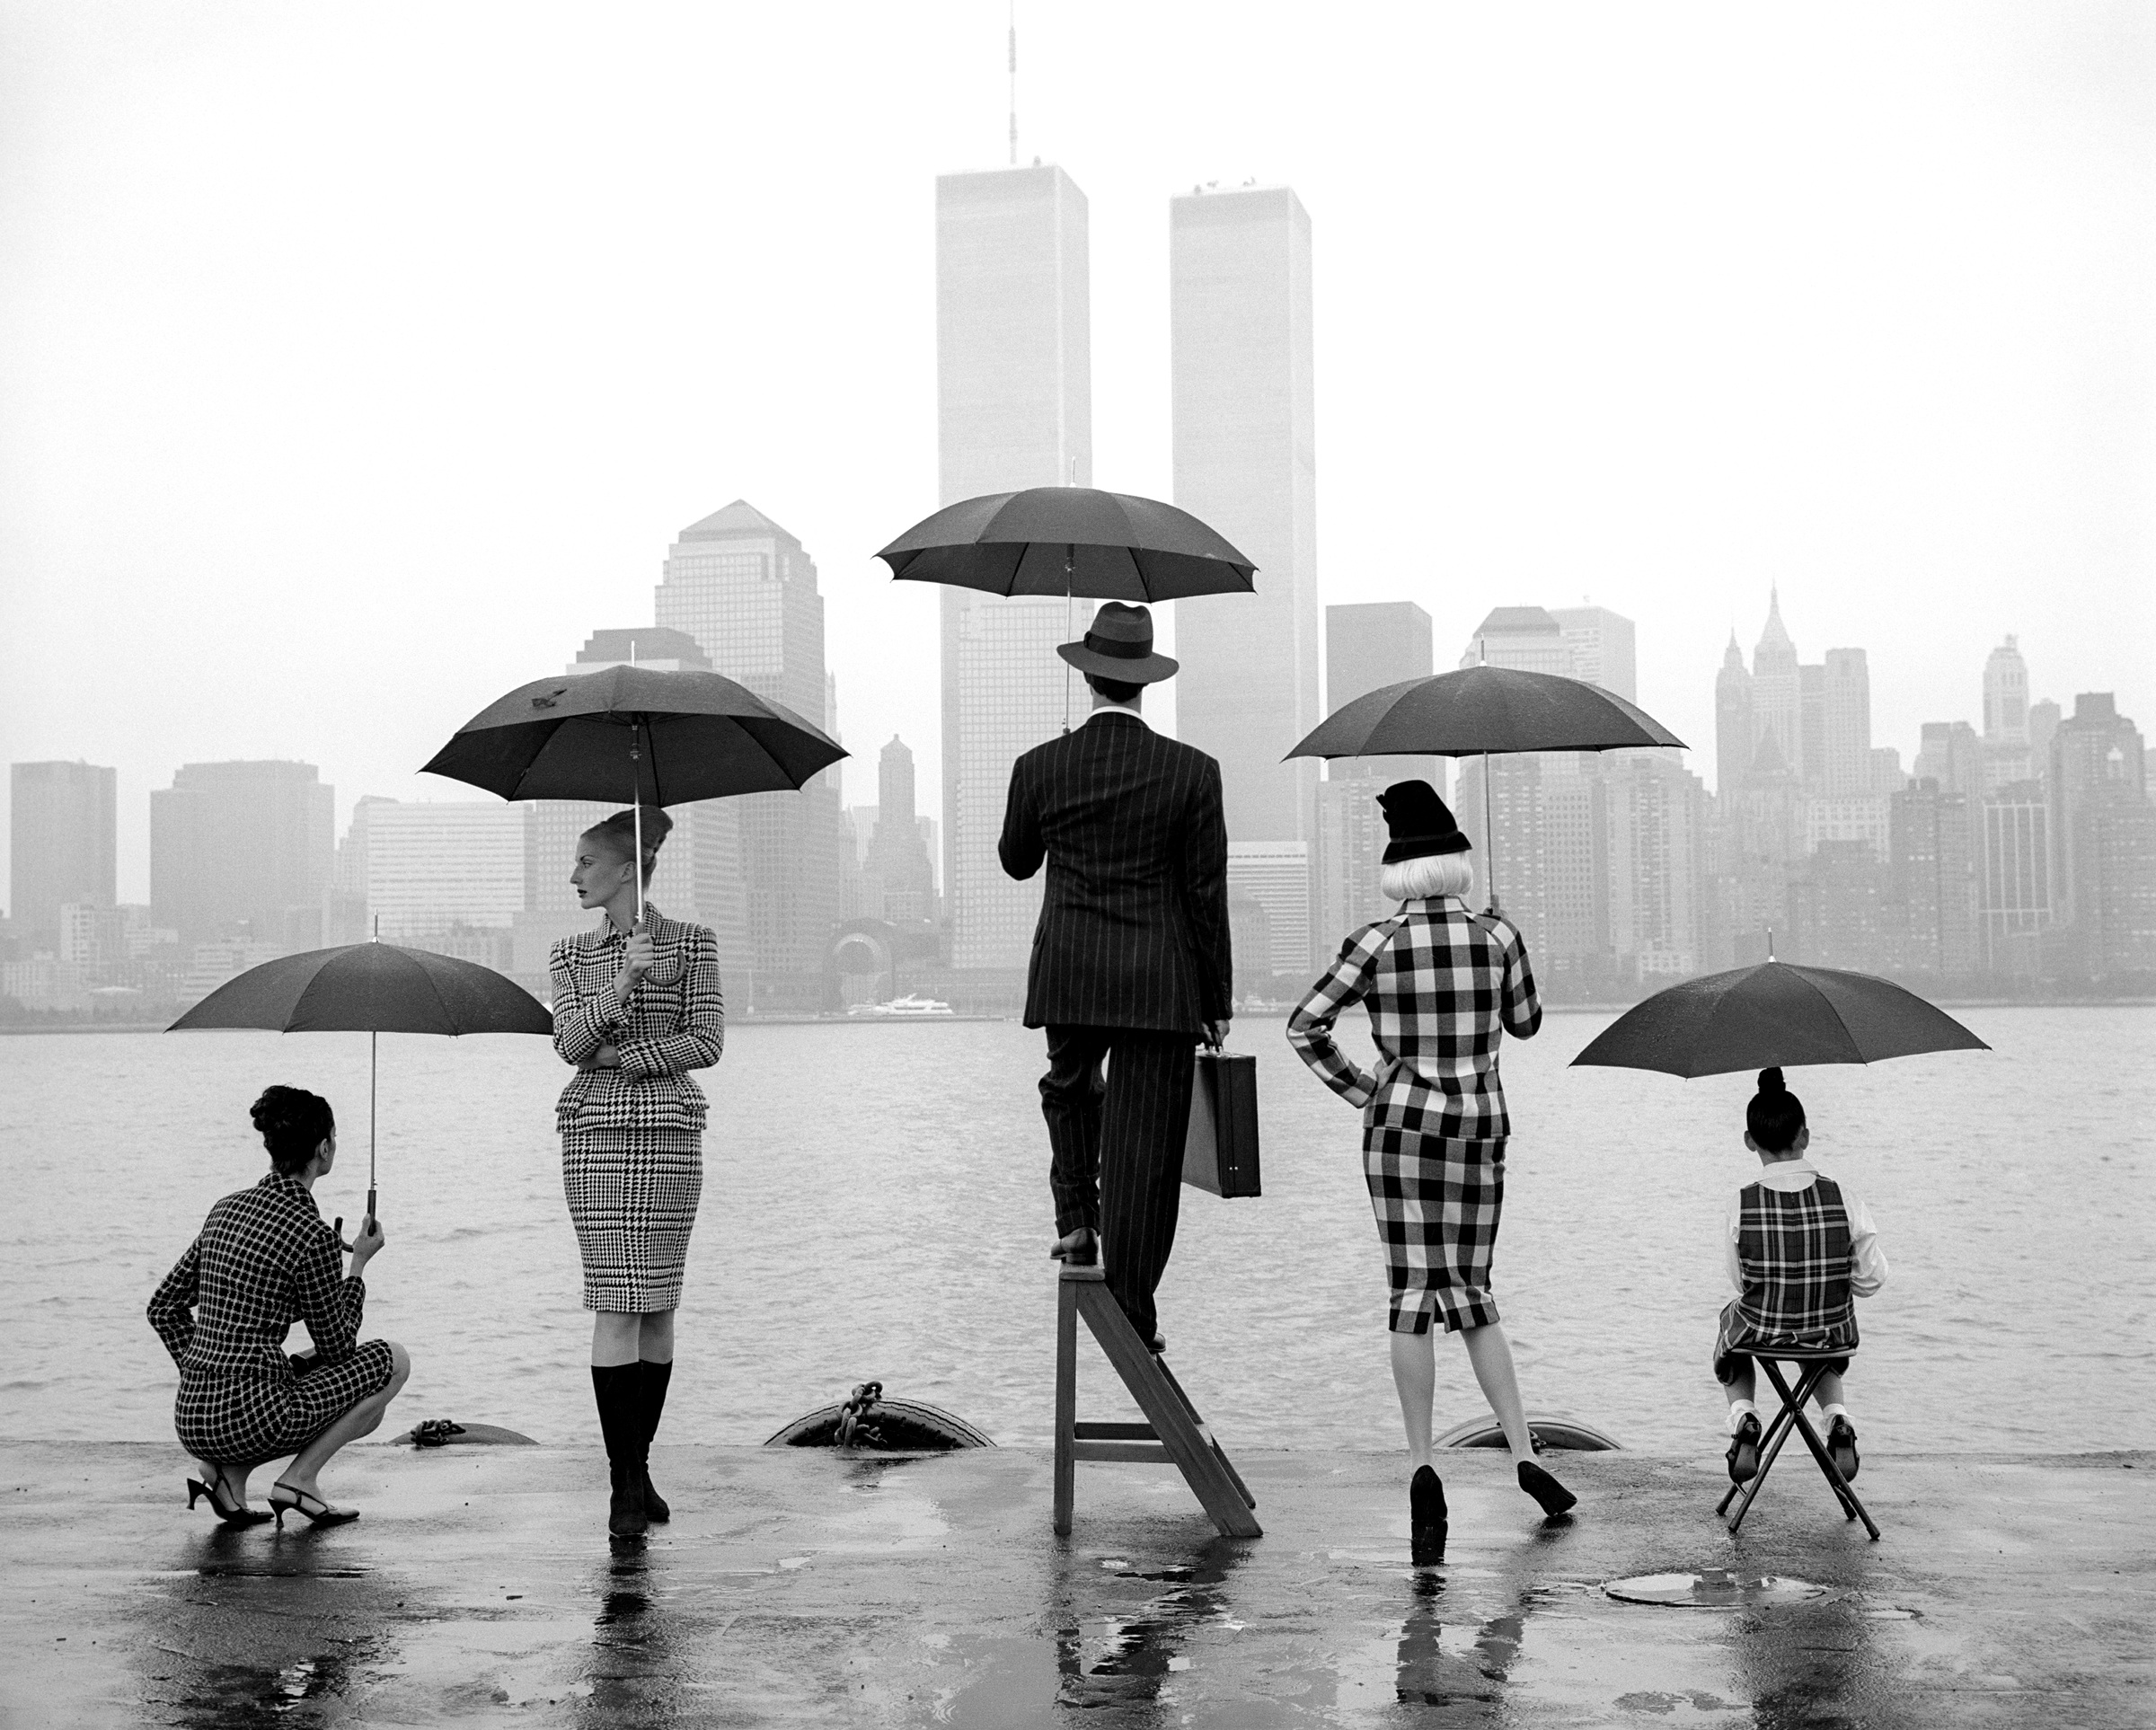 Skyline, Hudson River New York  1995 Archival pigment print 102 x 127 cm (image) 112 x 152 cm (paper)